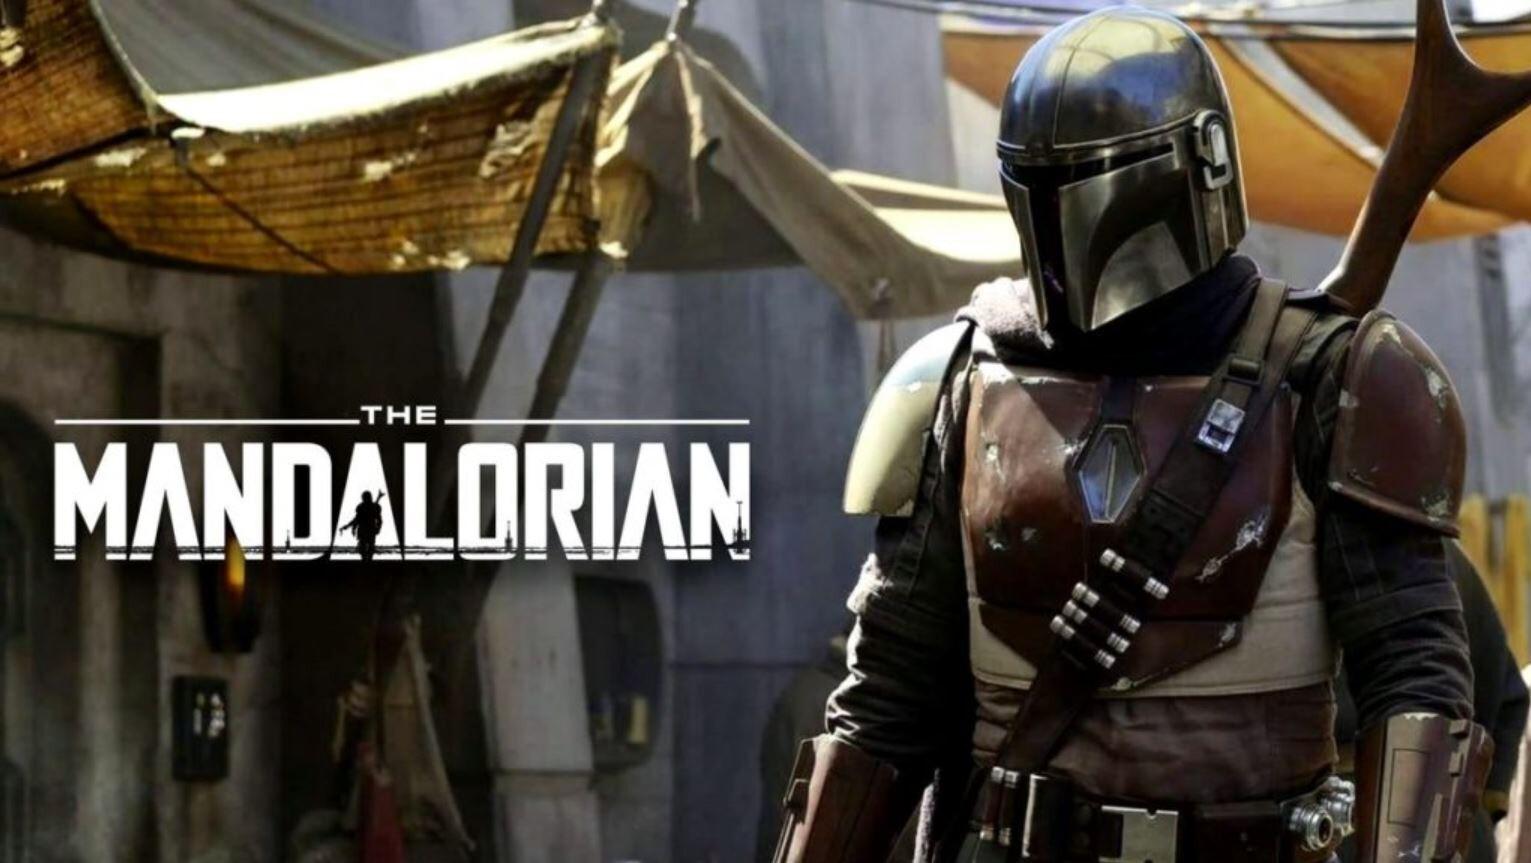 https://www.bellazon.com/main/uploads/monthly_2019_12/1167295992_Mandalorian001.JPG.9a311ed444f2312759a0d8db8109db07.JPG